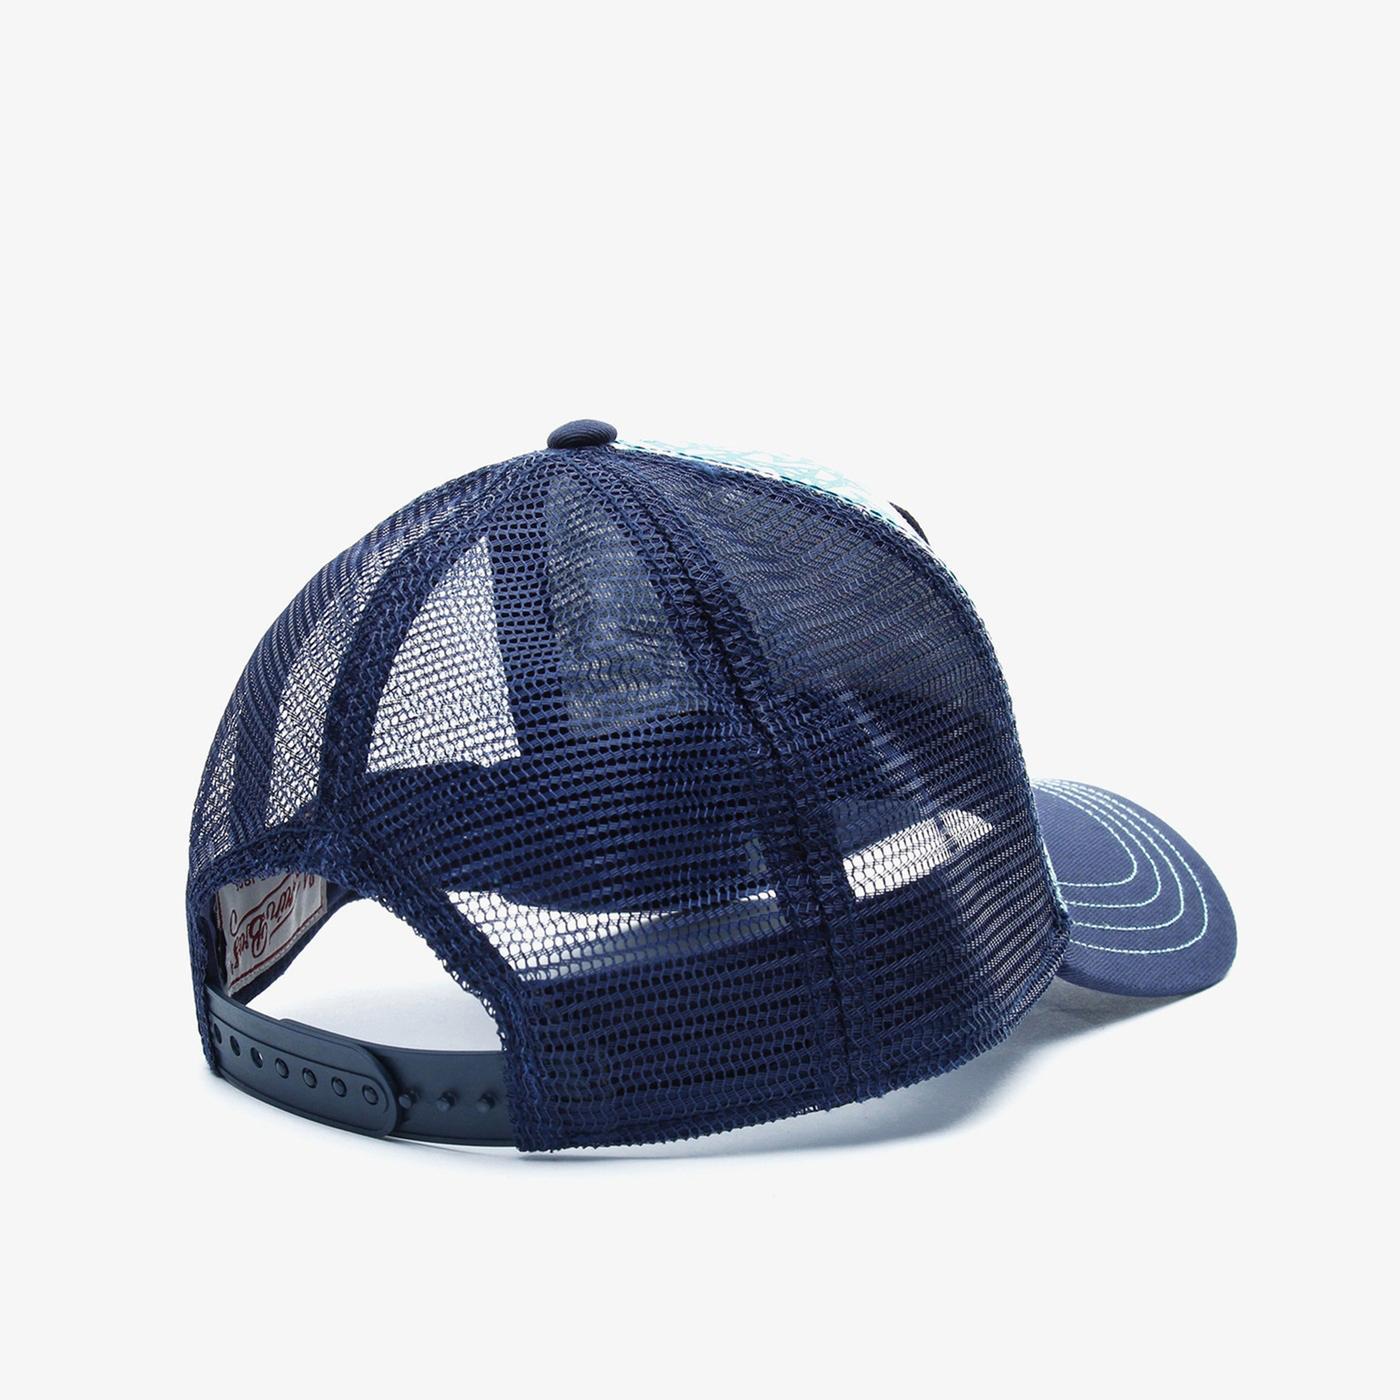 Goorin Bros Clothing Optional Unisex Mavi Şapka